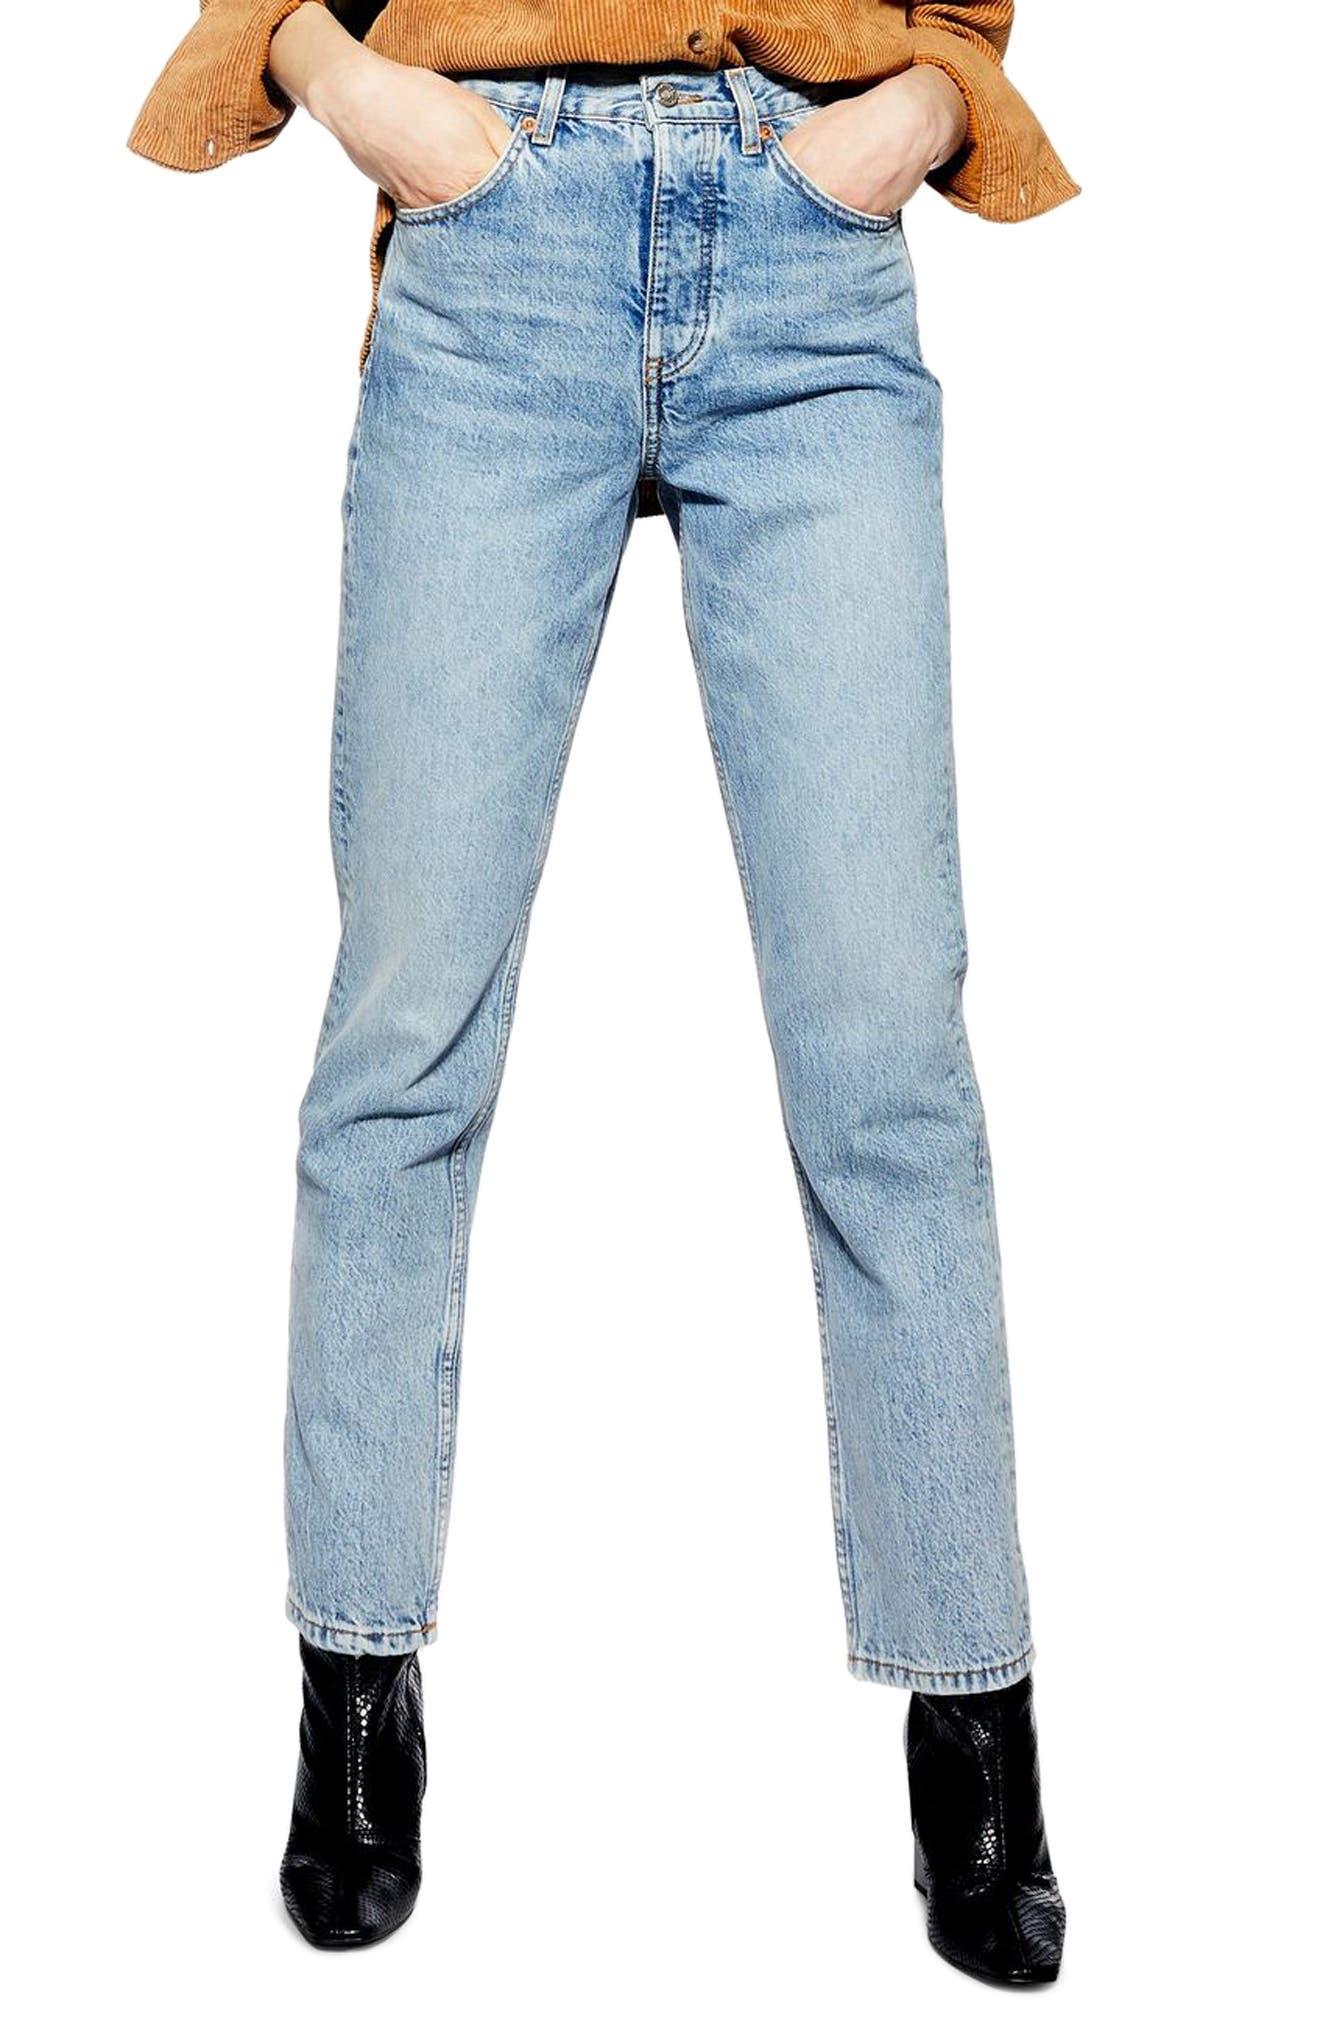 TOPSHOP, Editor Straight Leg Jeans, Main thumbnail 1, color, BLEACH